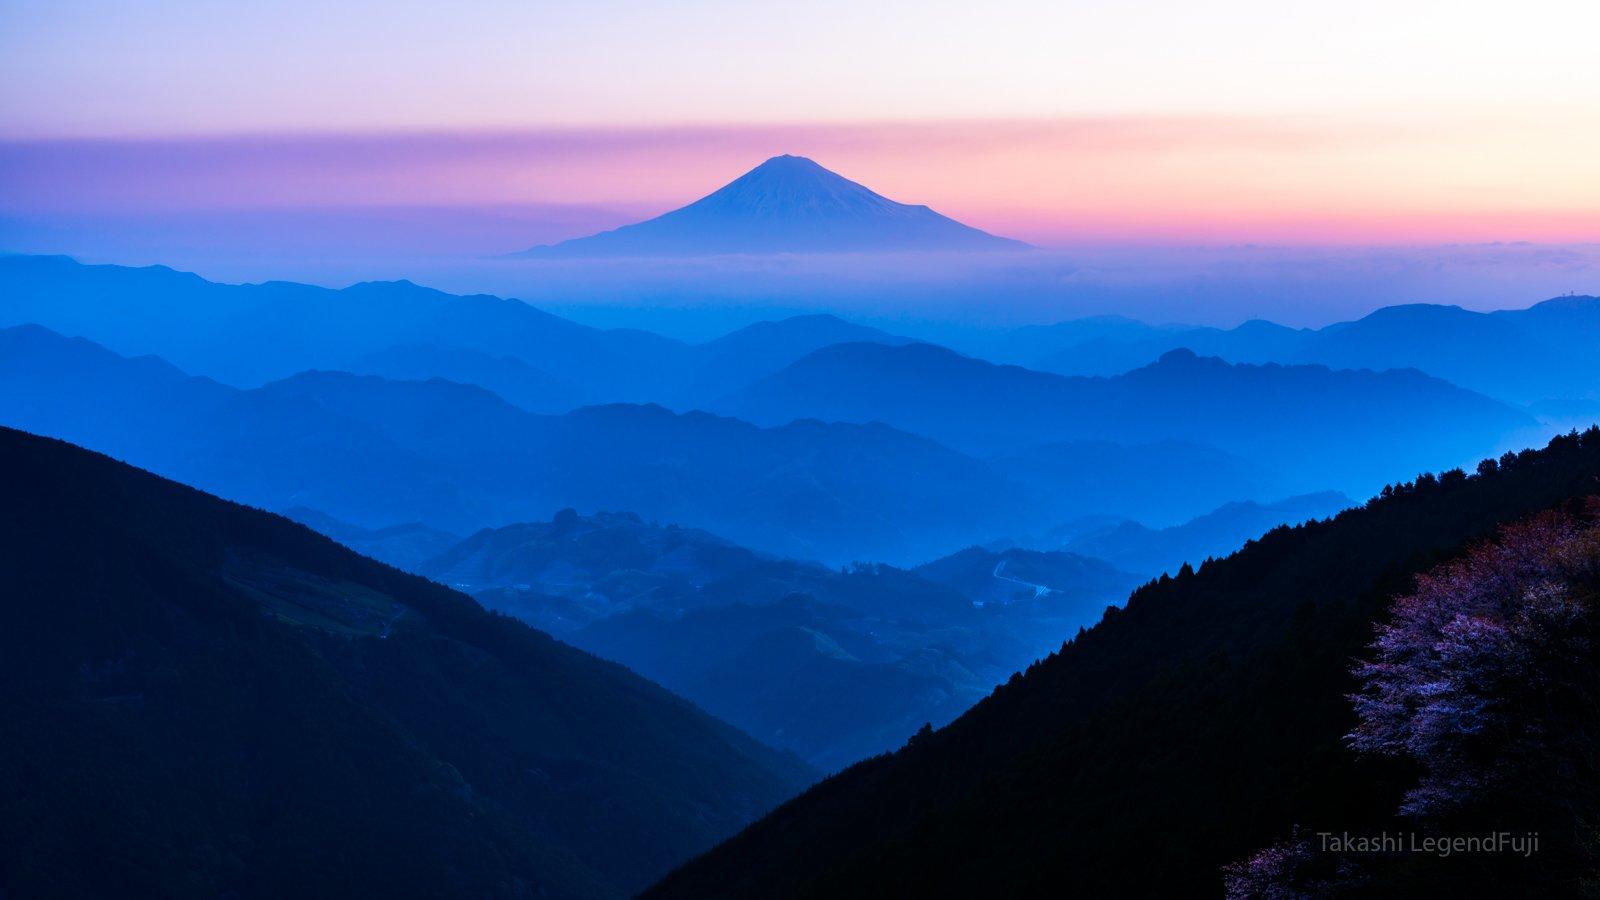 Fuji,mountain,Sakura,cherry,morning,dawn,blue,pink,beautiful,amazing,, Takashi